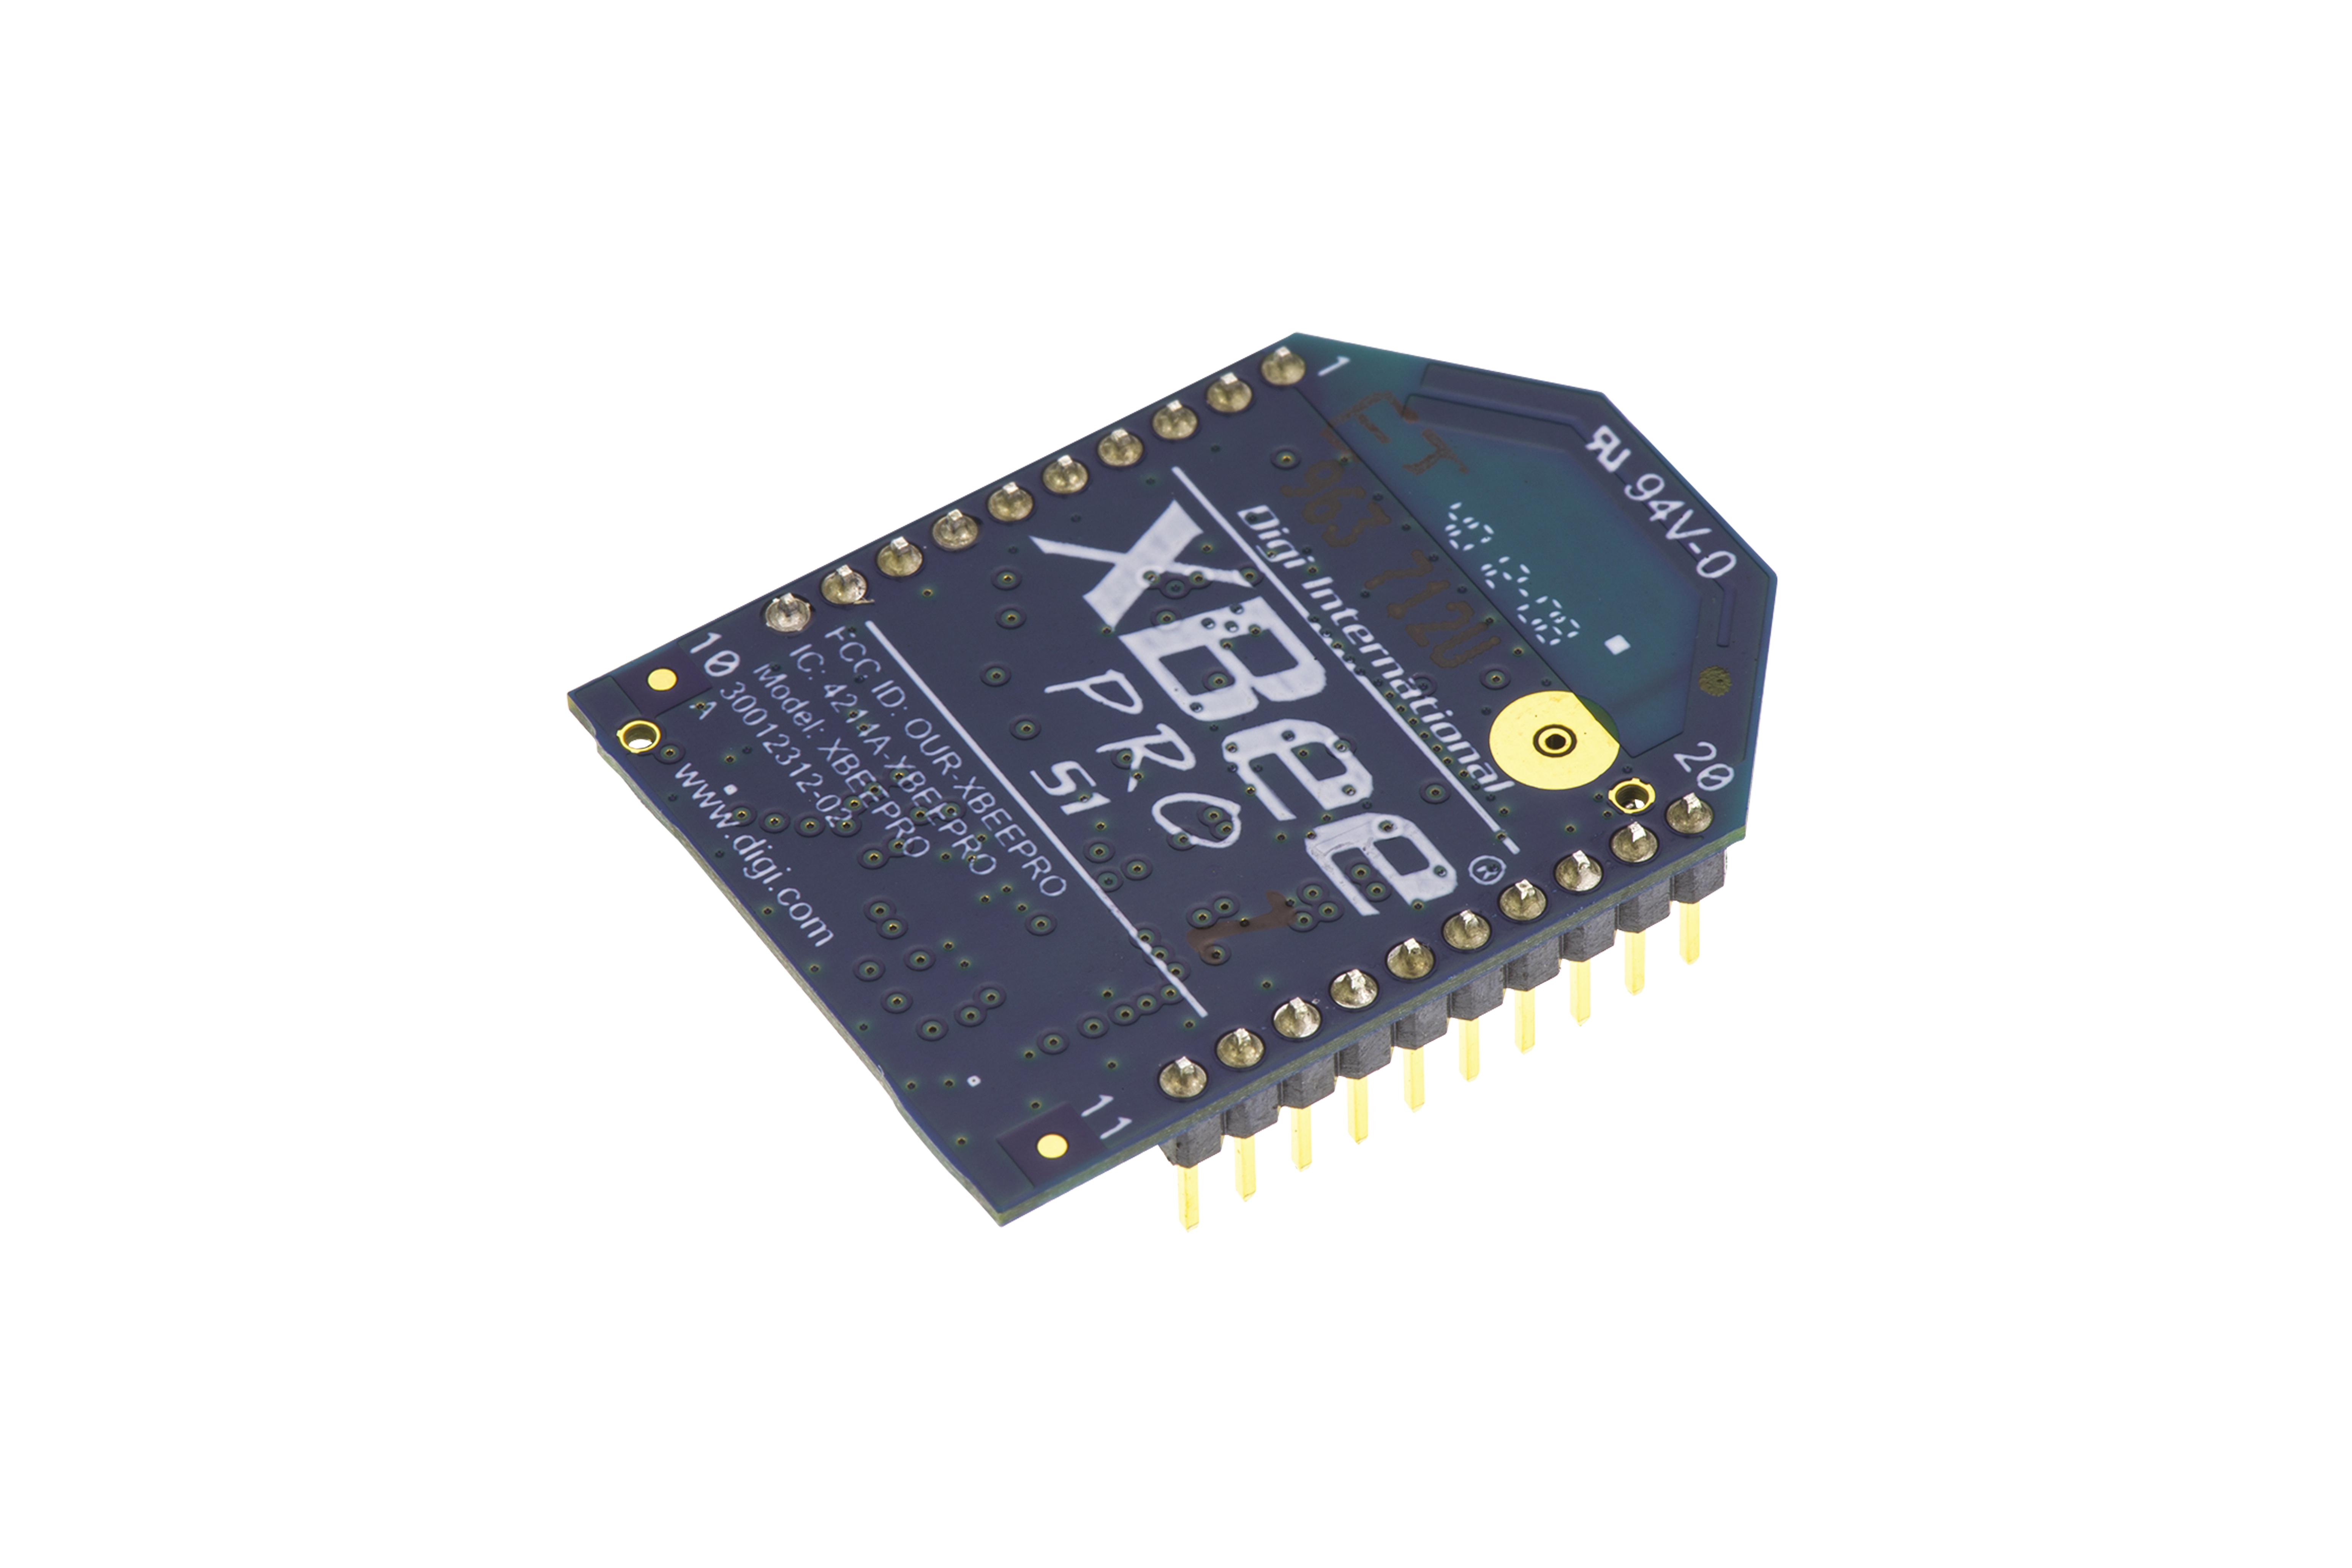 XBee-PRO Modulo RF con antenna a stilo 10mW